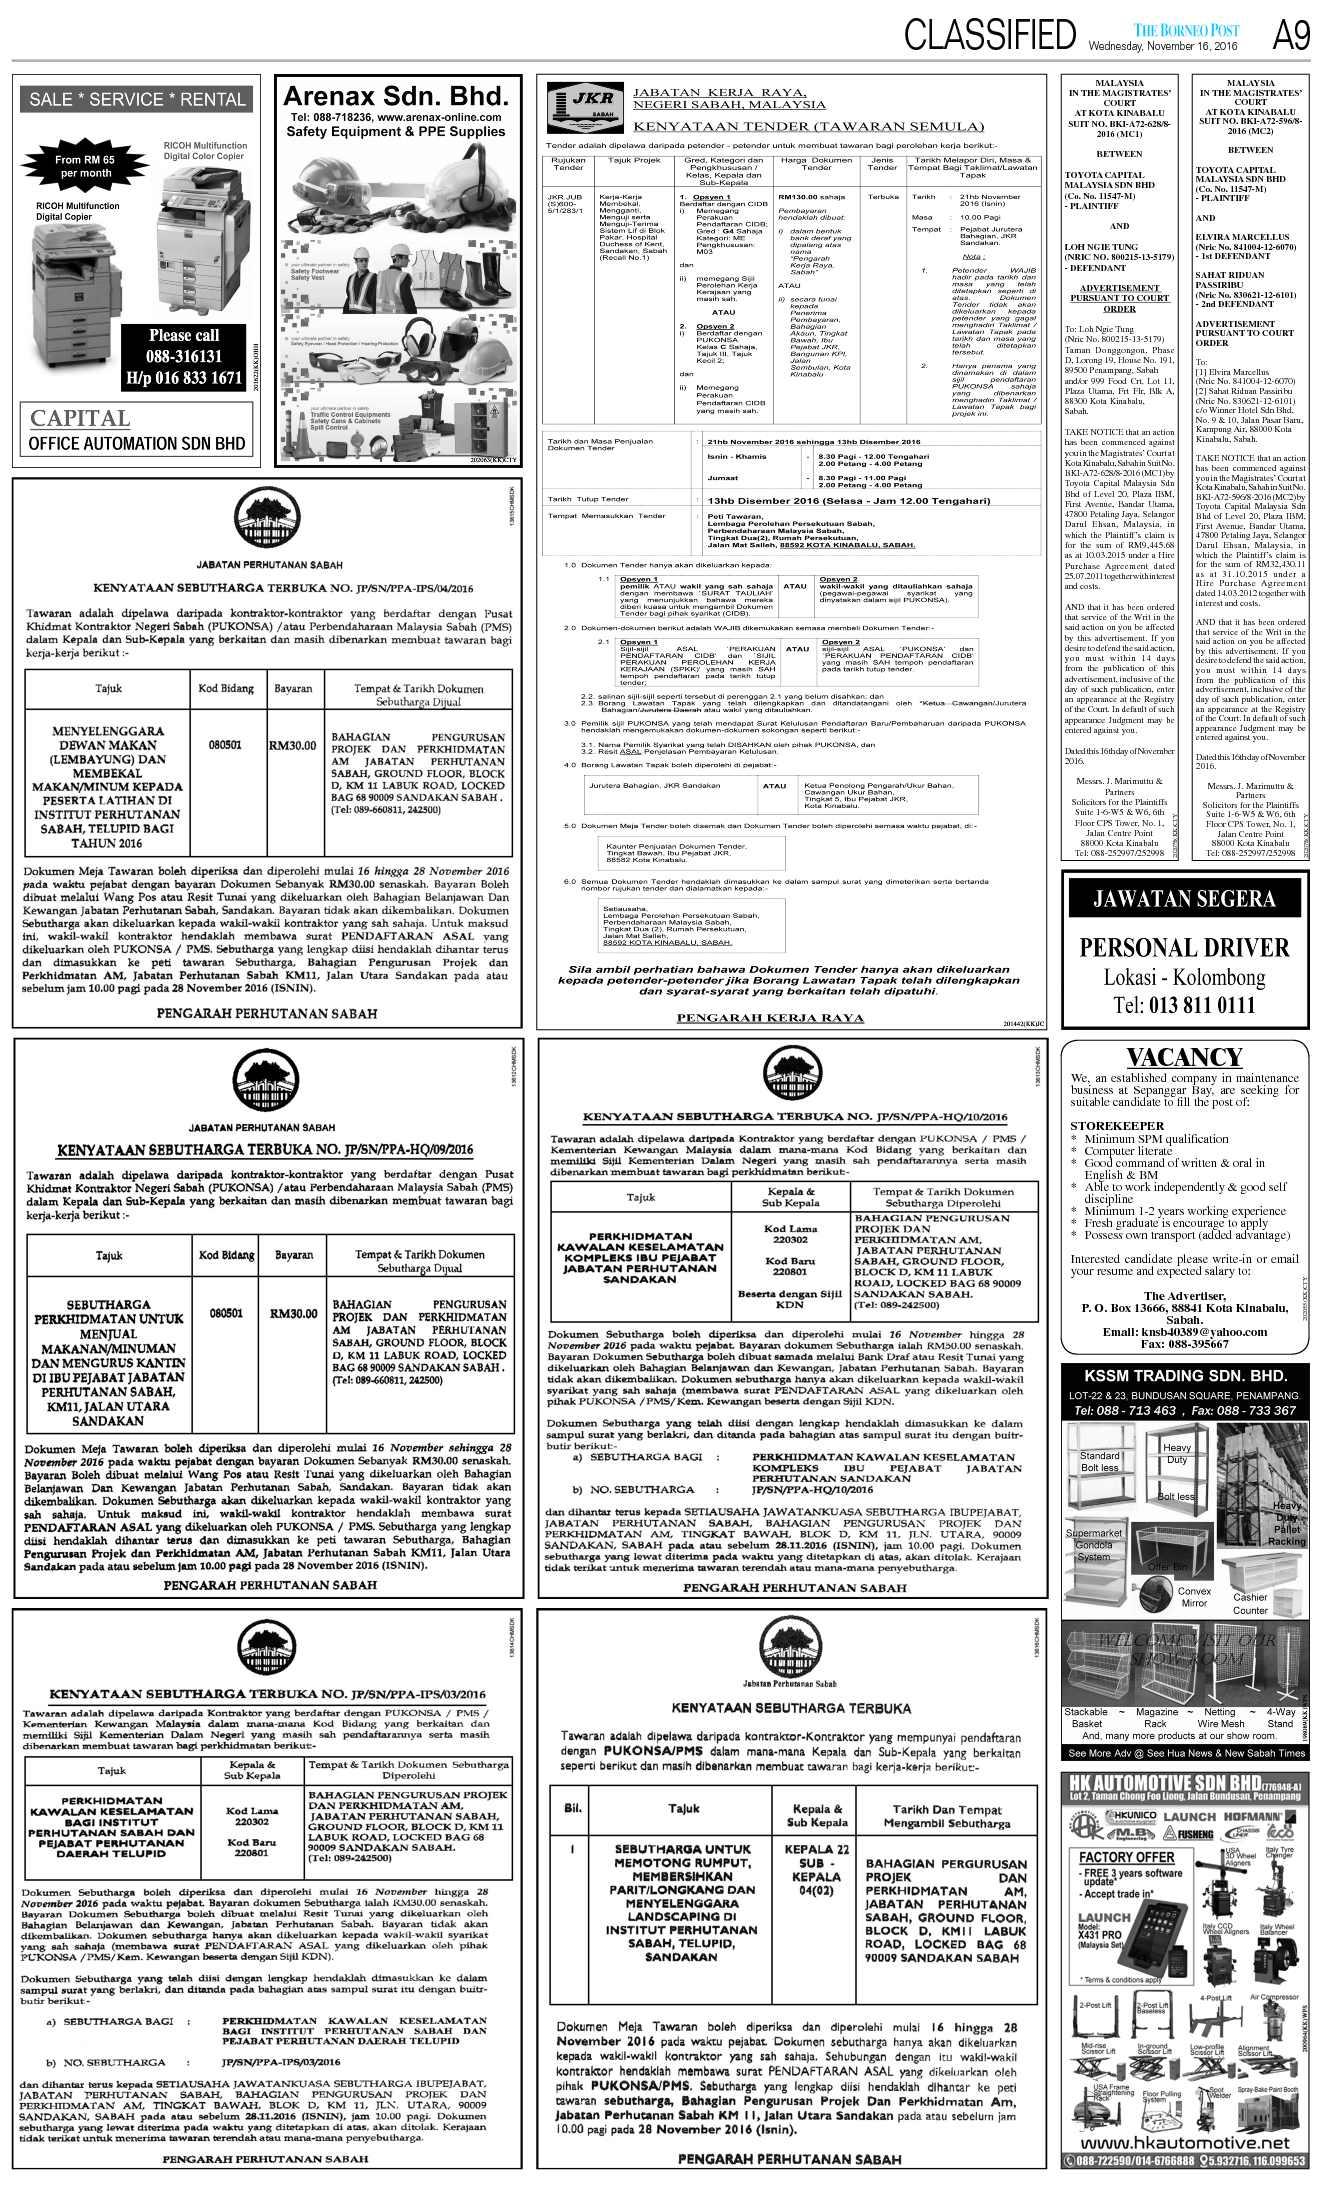 Wednesday Nov 16 The Borneo Post Classifieds